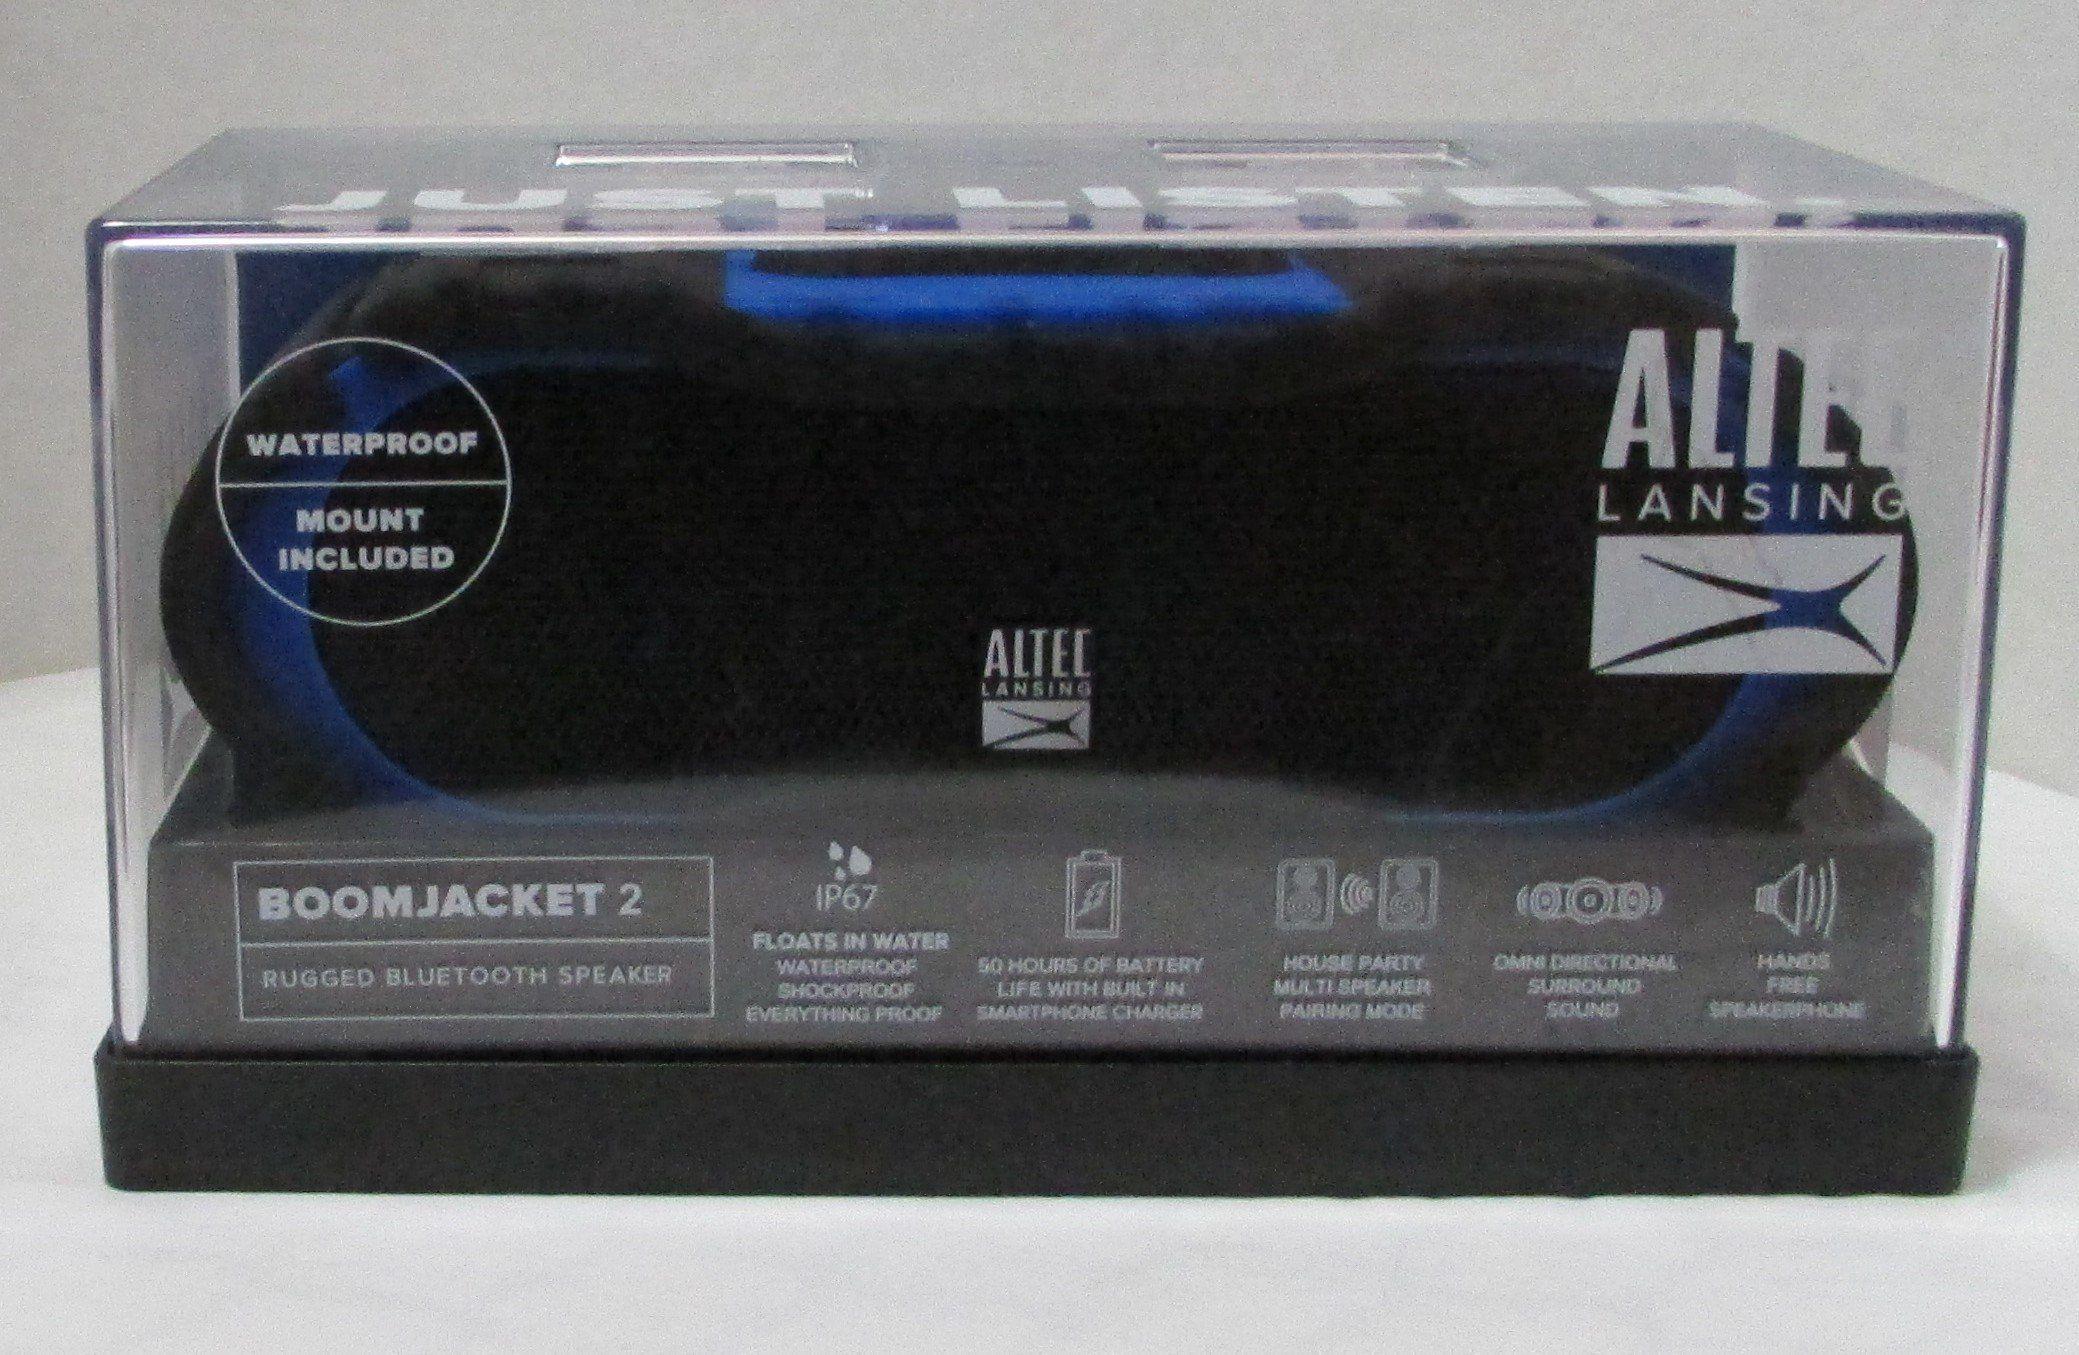 Altec Lansing Boom Jacket 2 Rugged Bluetooth Speaker Blue